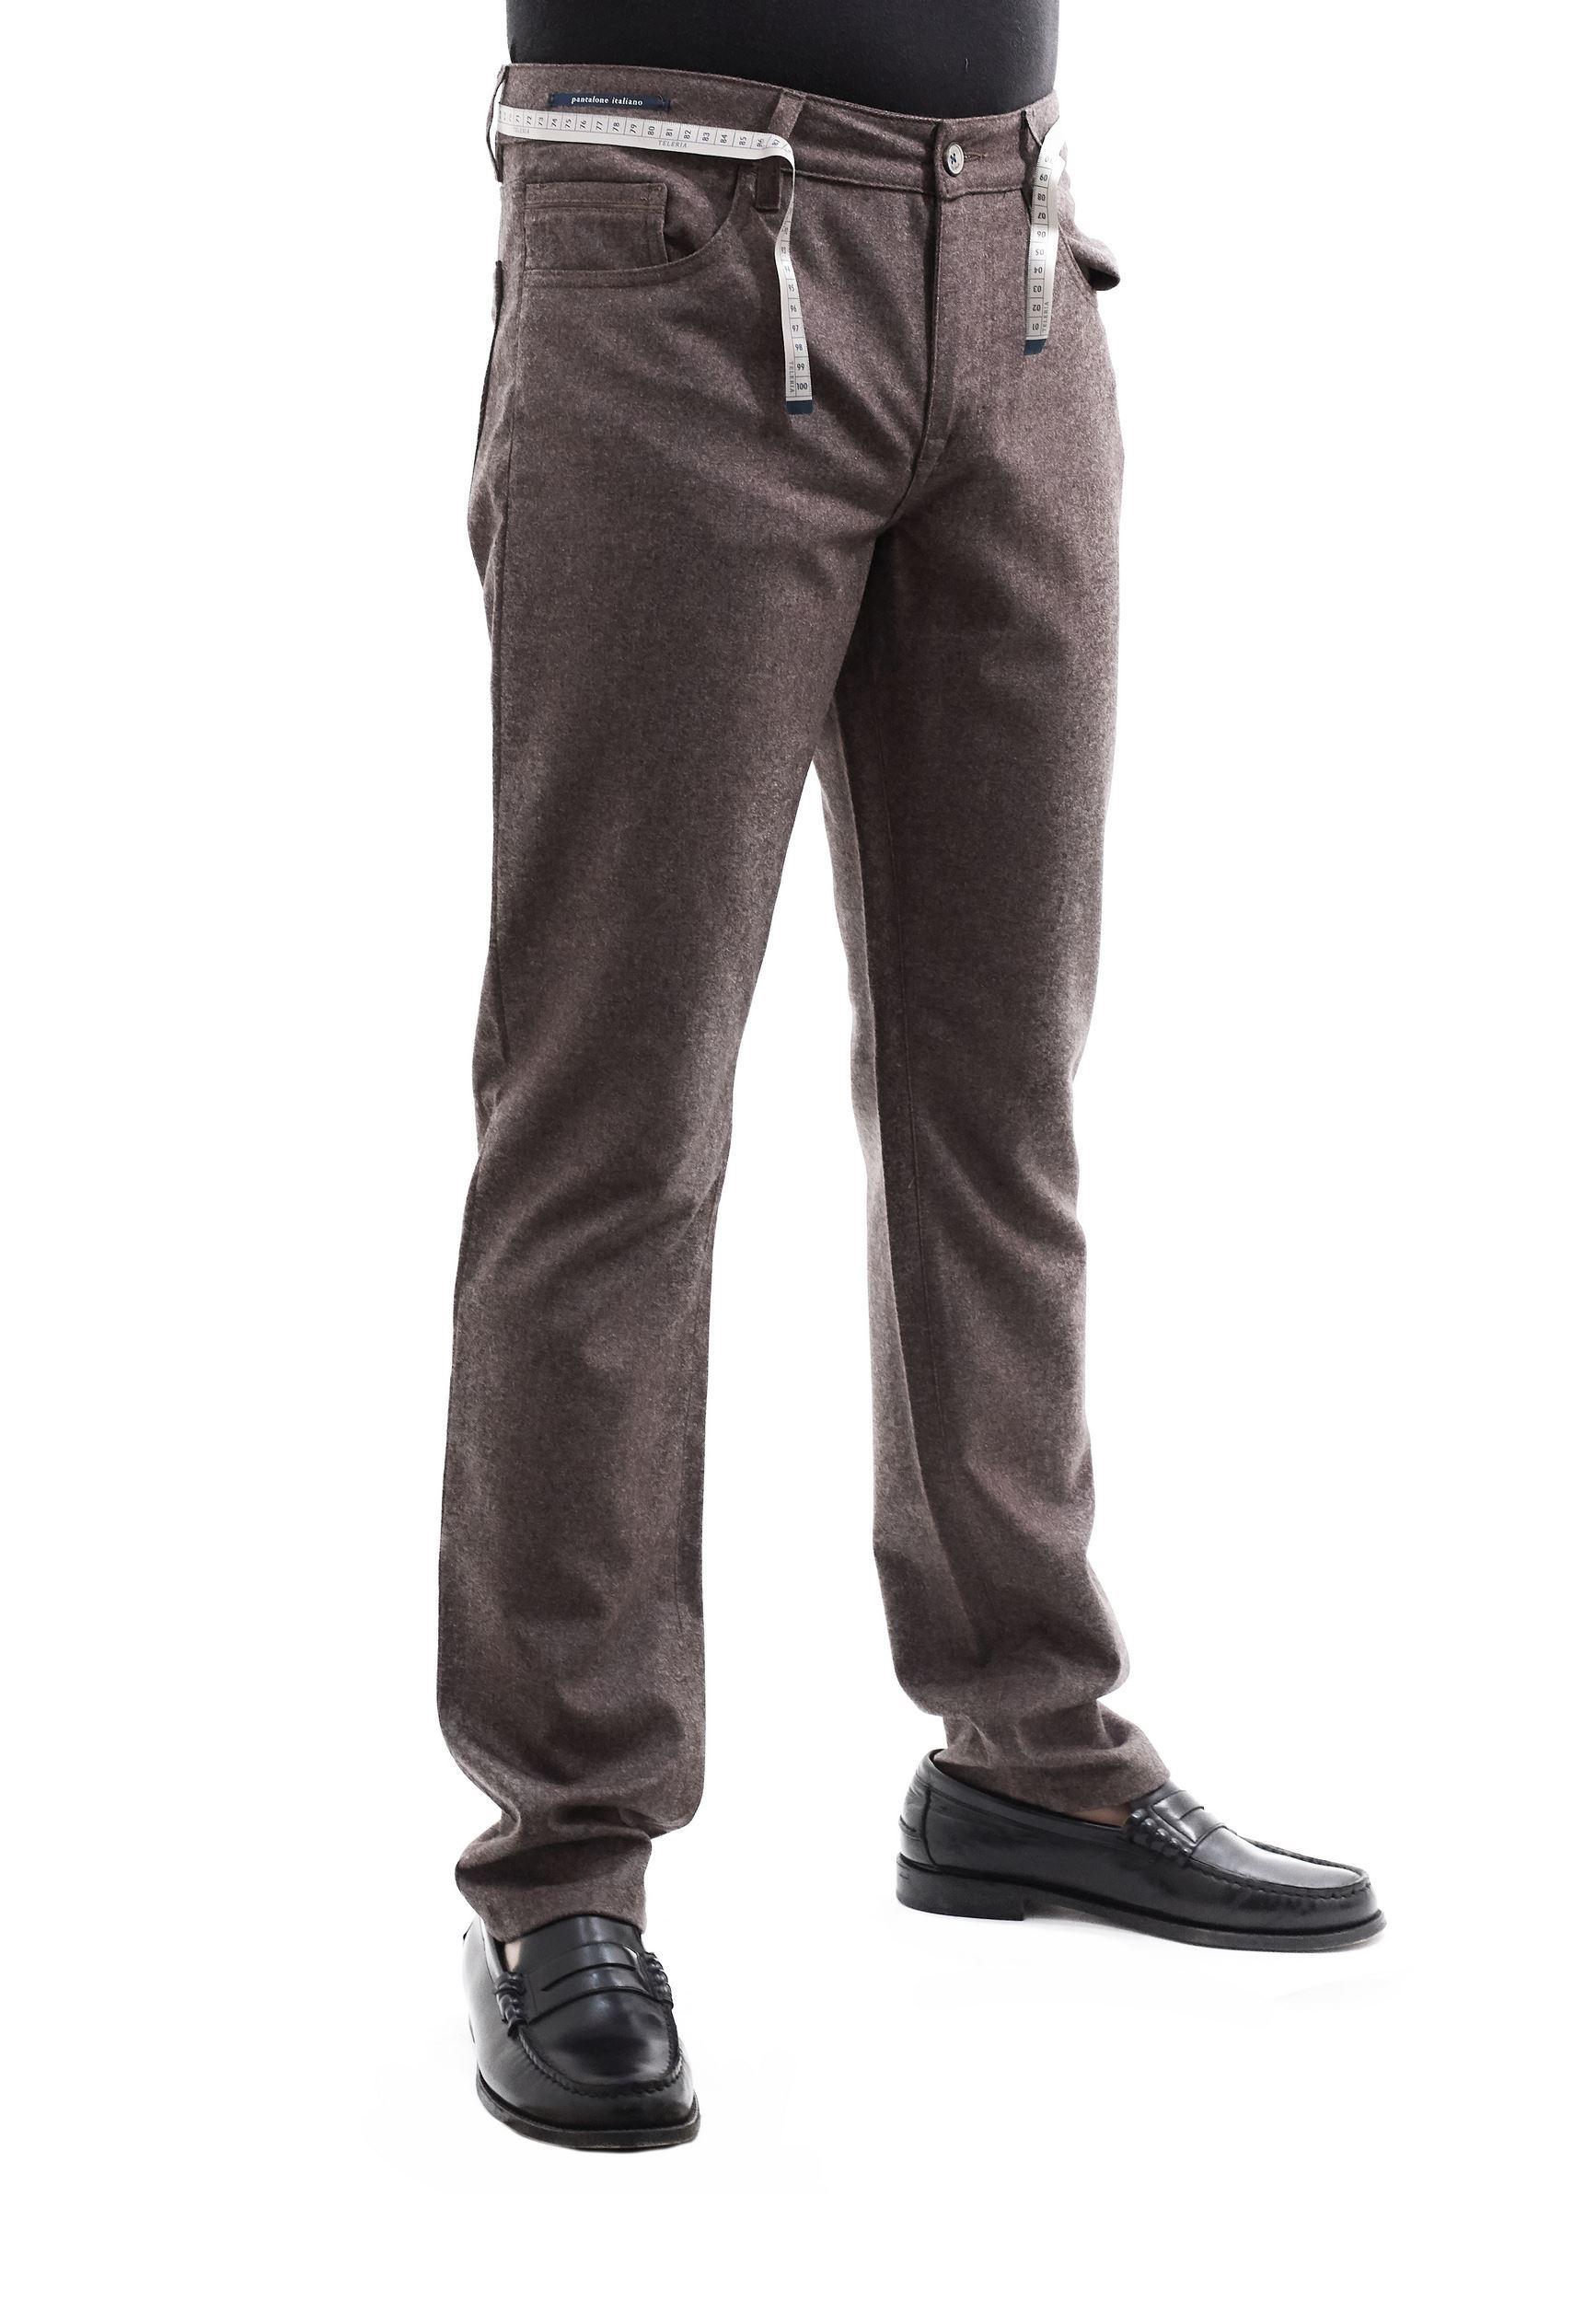 Immagine di Pantalone 5 tasche in lana Marrone